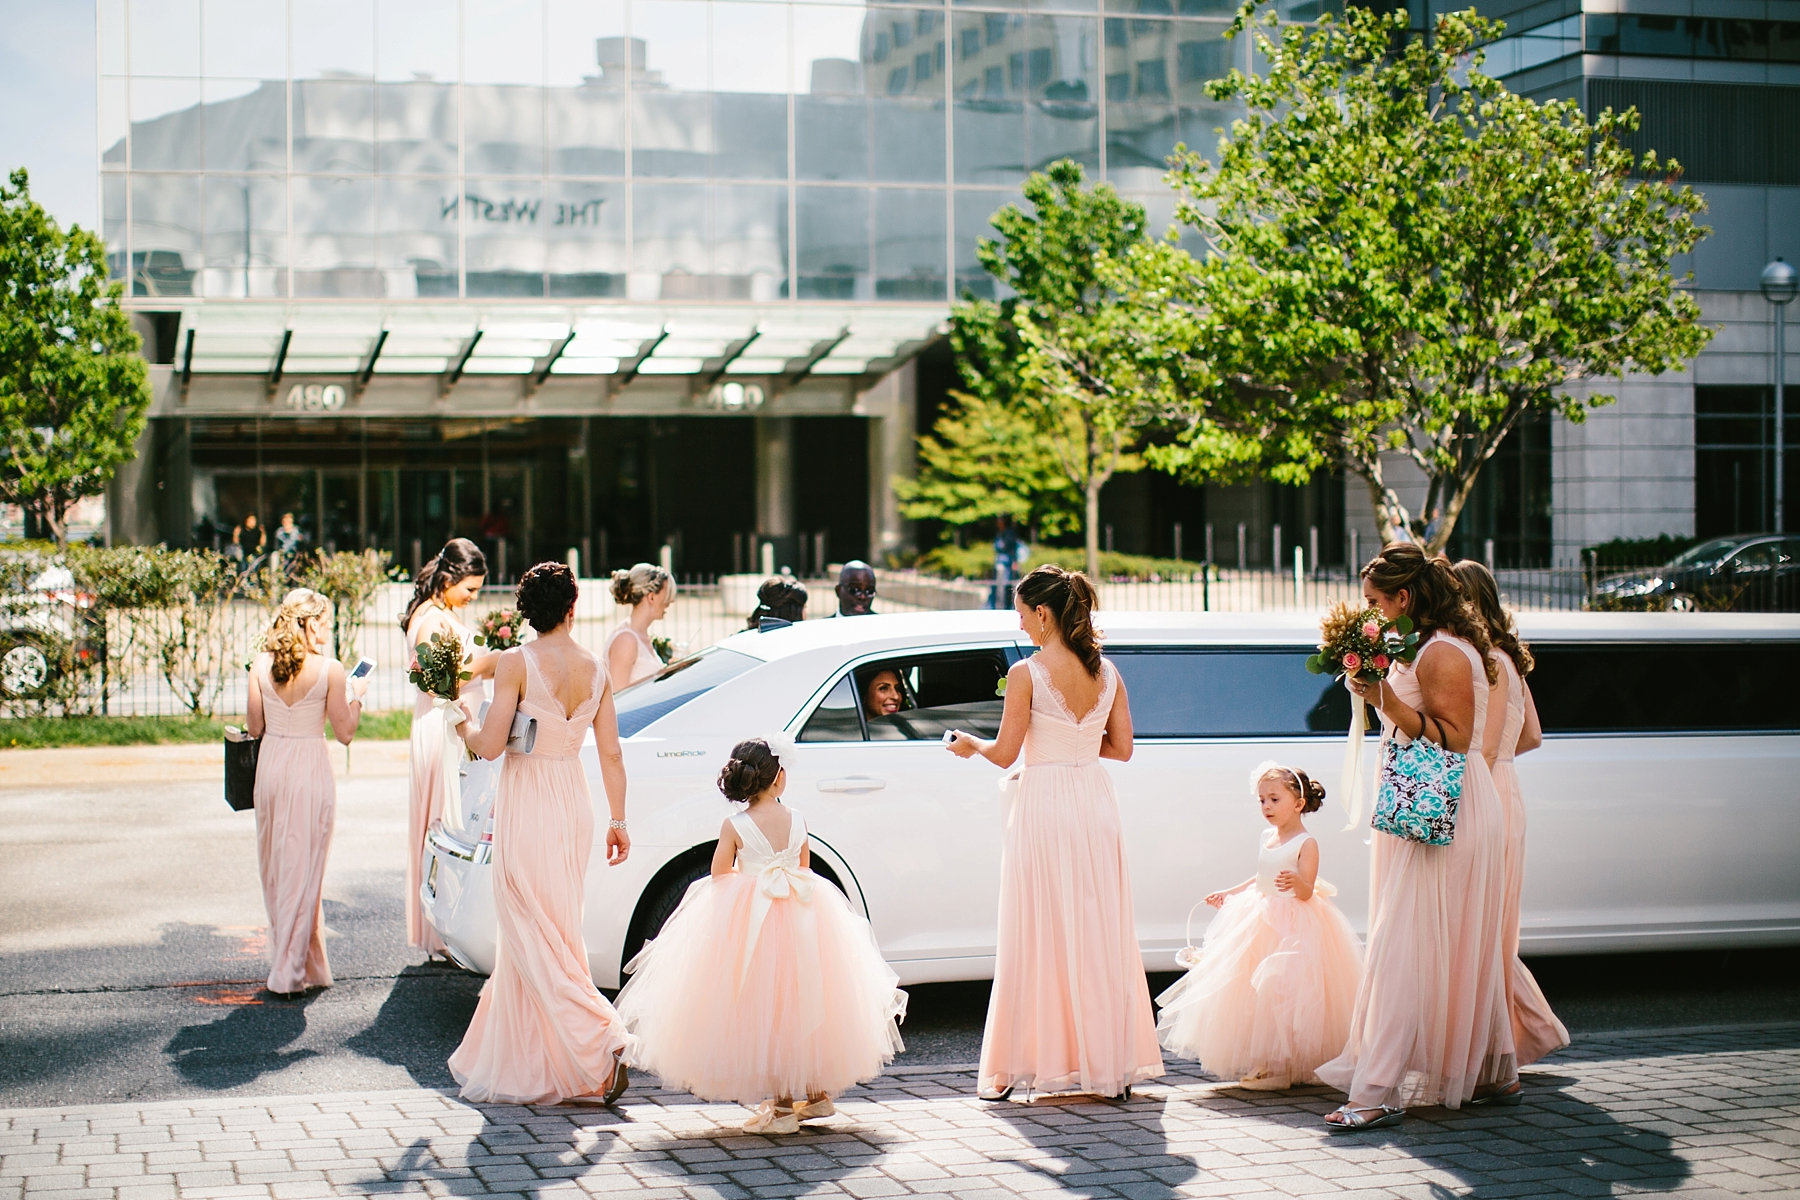 liberty-state-park-wedding-photographer-ny-nj_0020.jpg